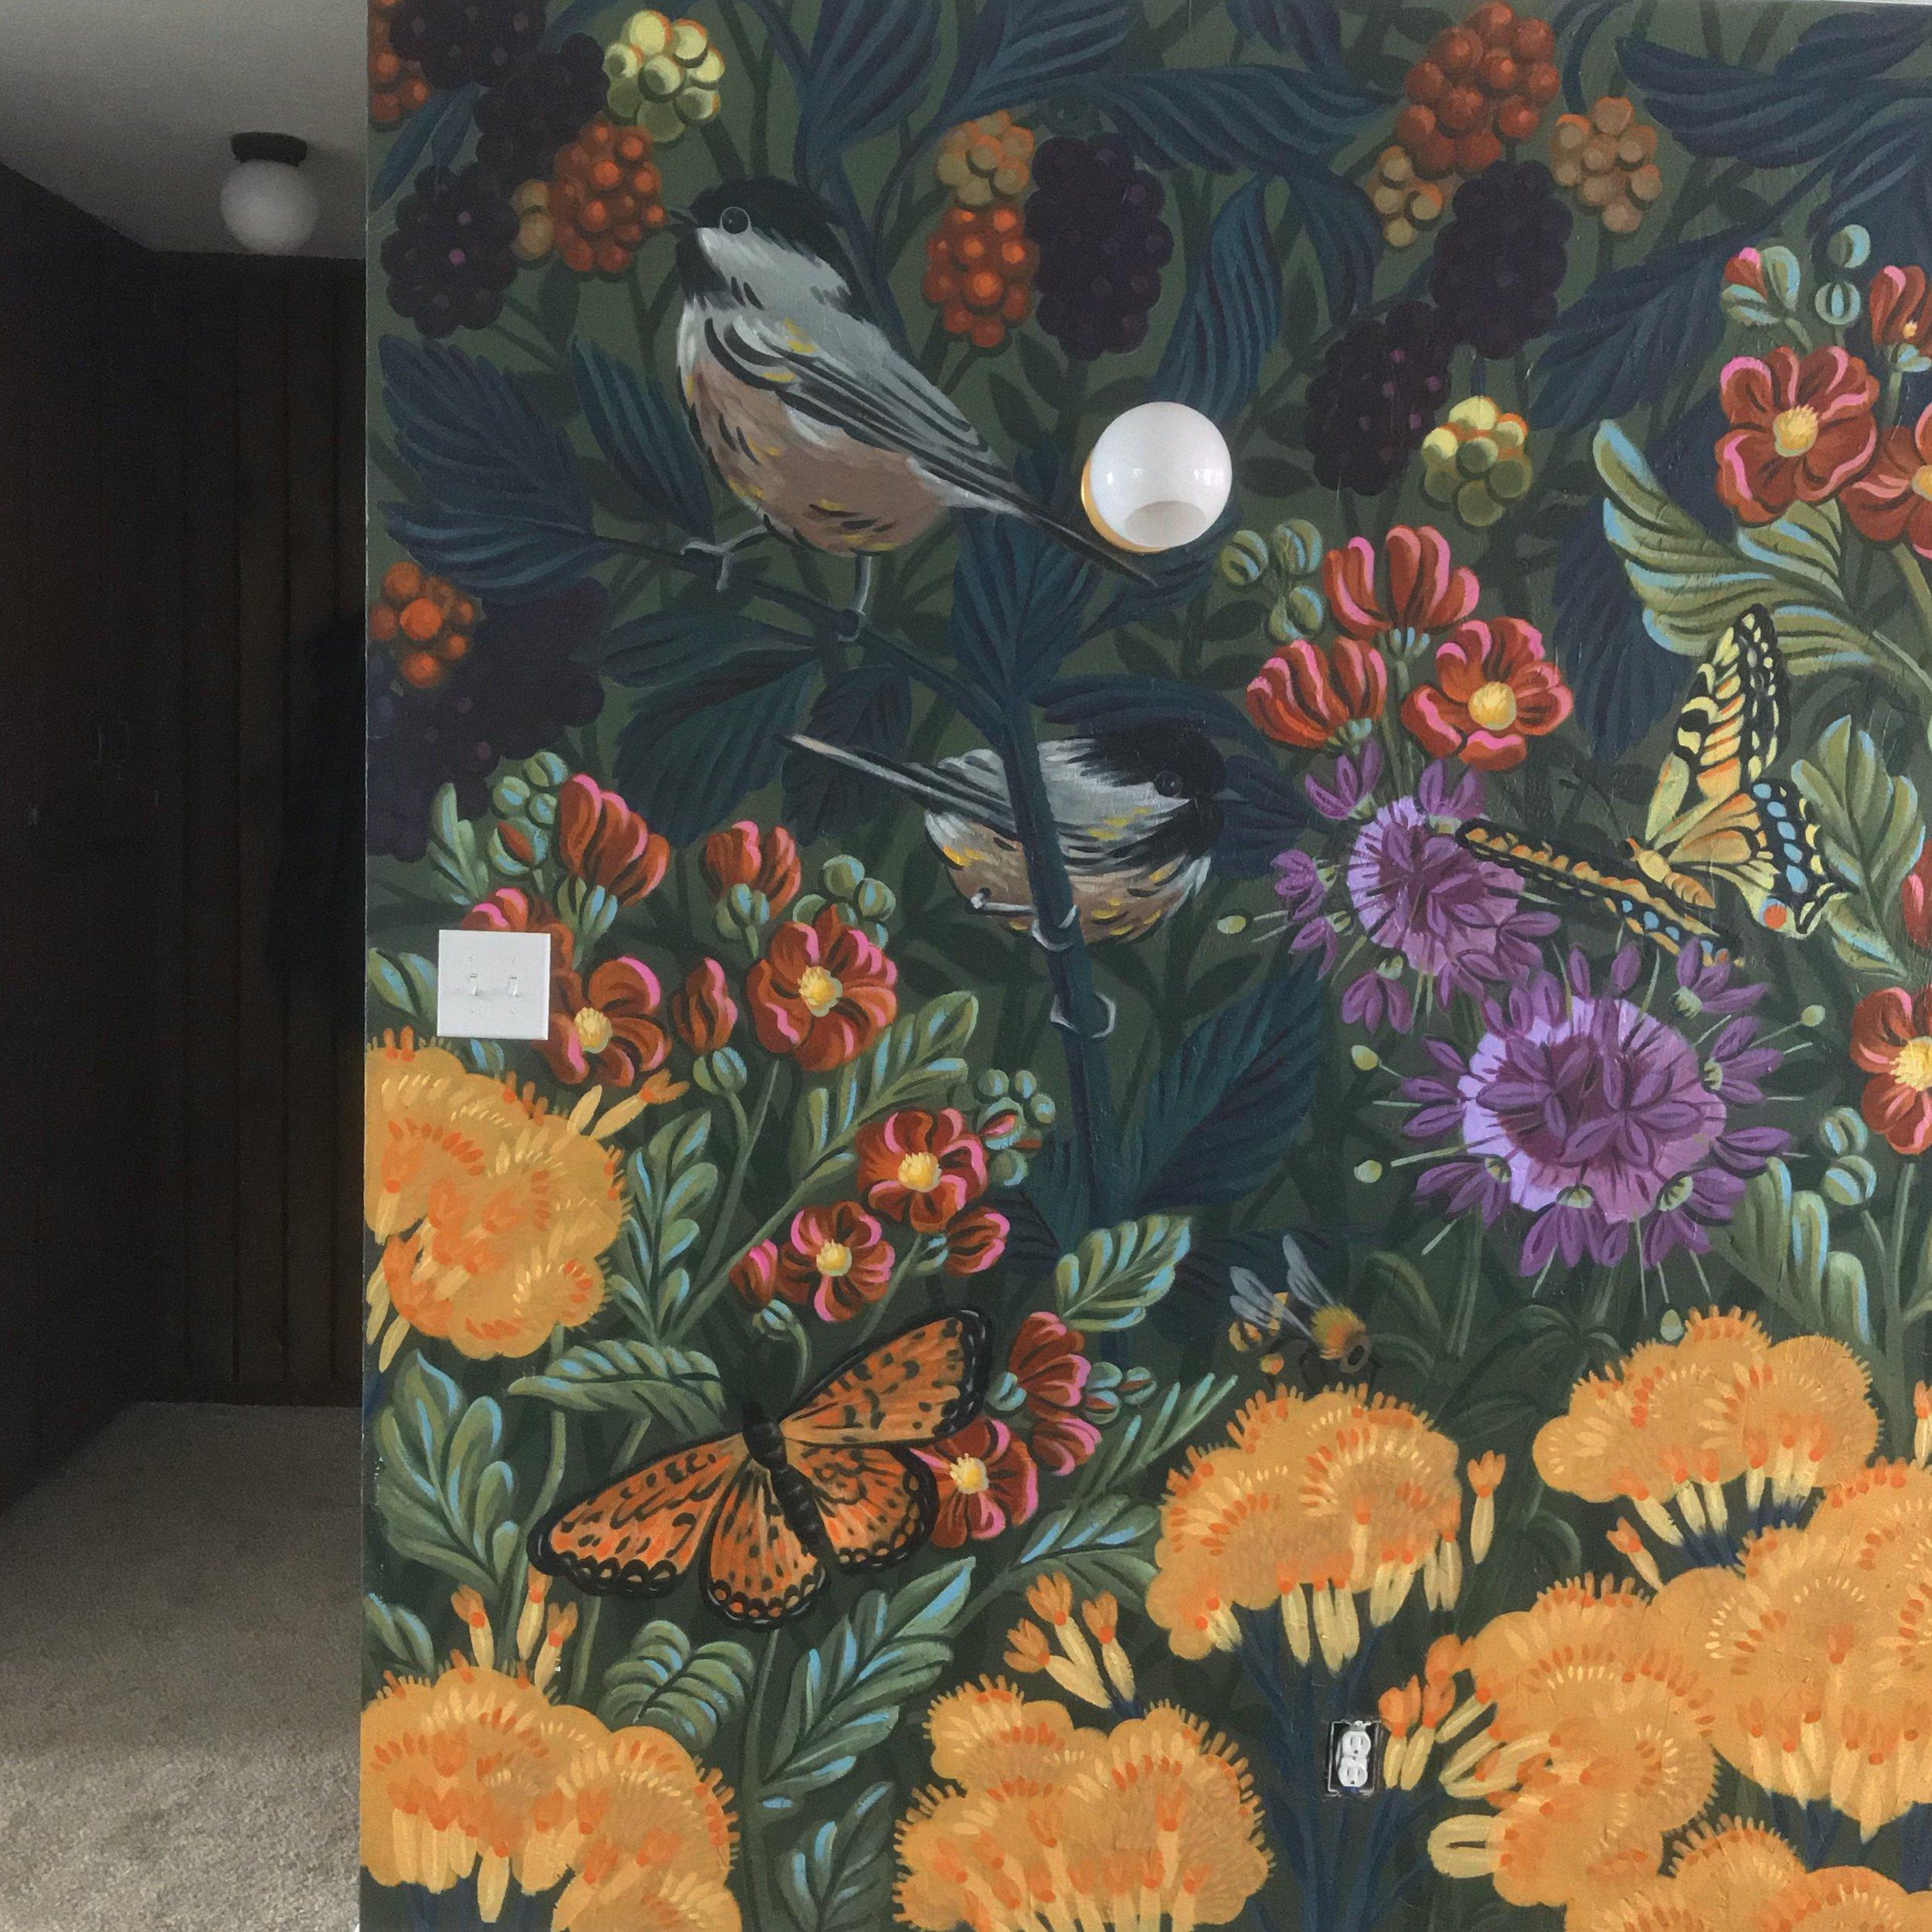 JillDeHaan_FloraFauna_Mural3.JPG